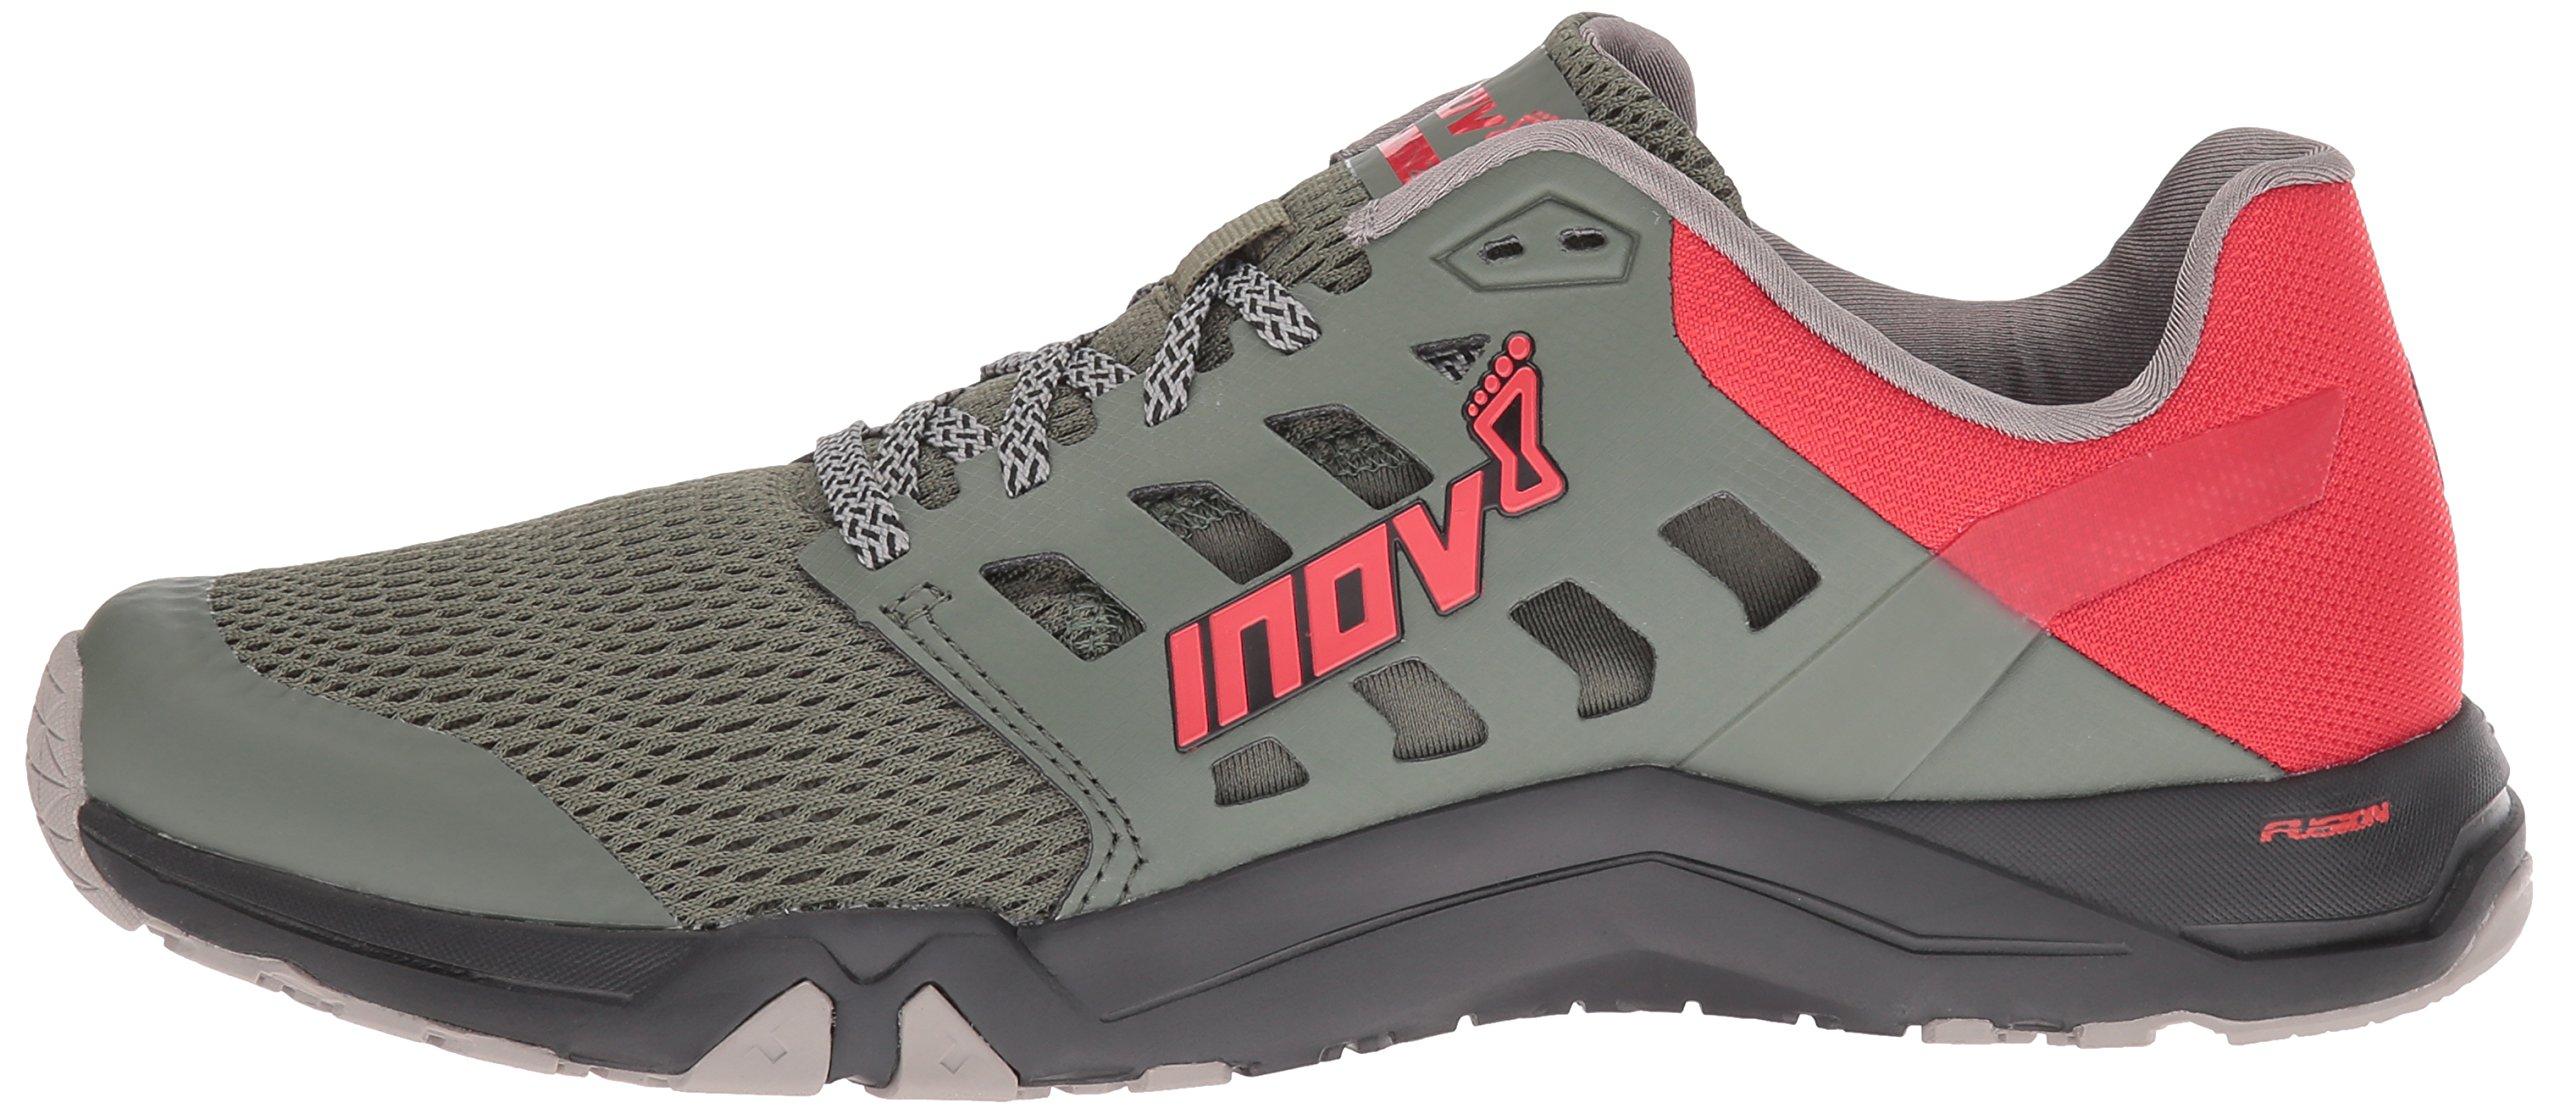 Inov-8 Men's All Train 215 Cross-Trainer Shoe, Dark Green/Red/Black, 12 D US by Inov-8 (Image #5)